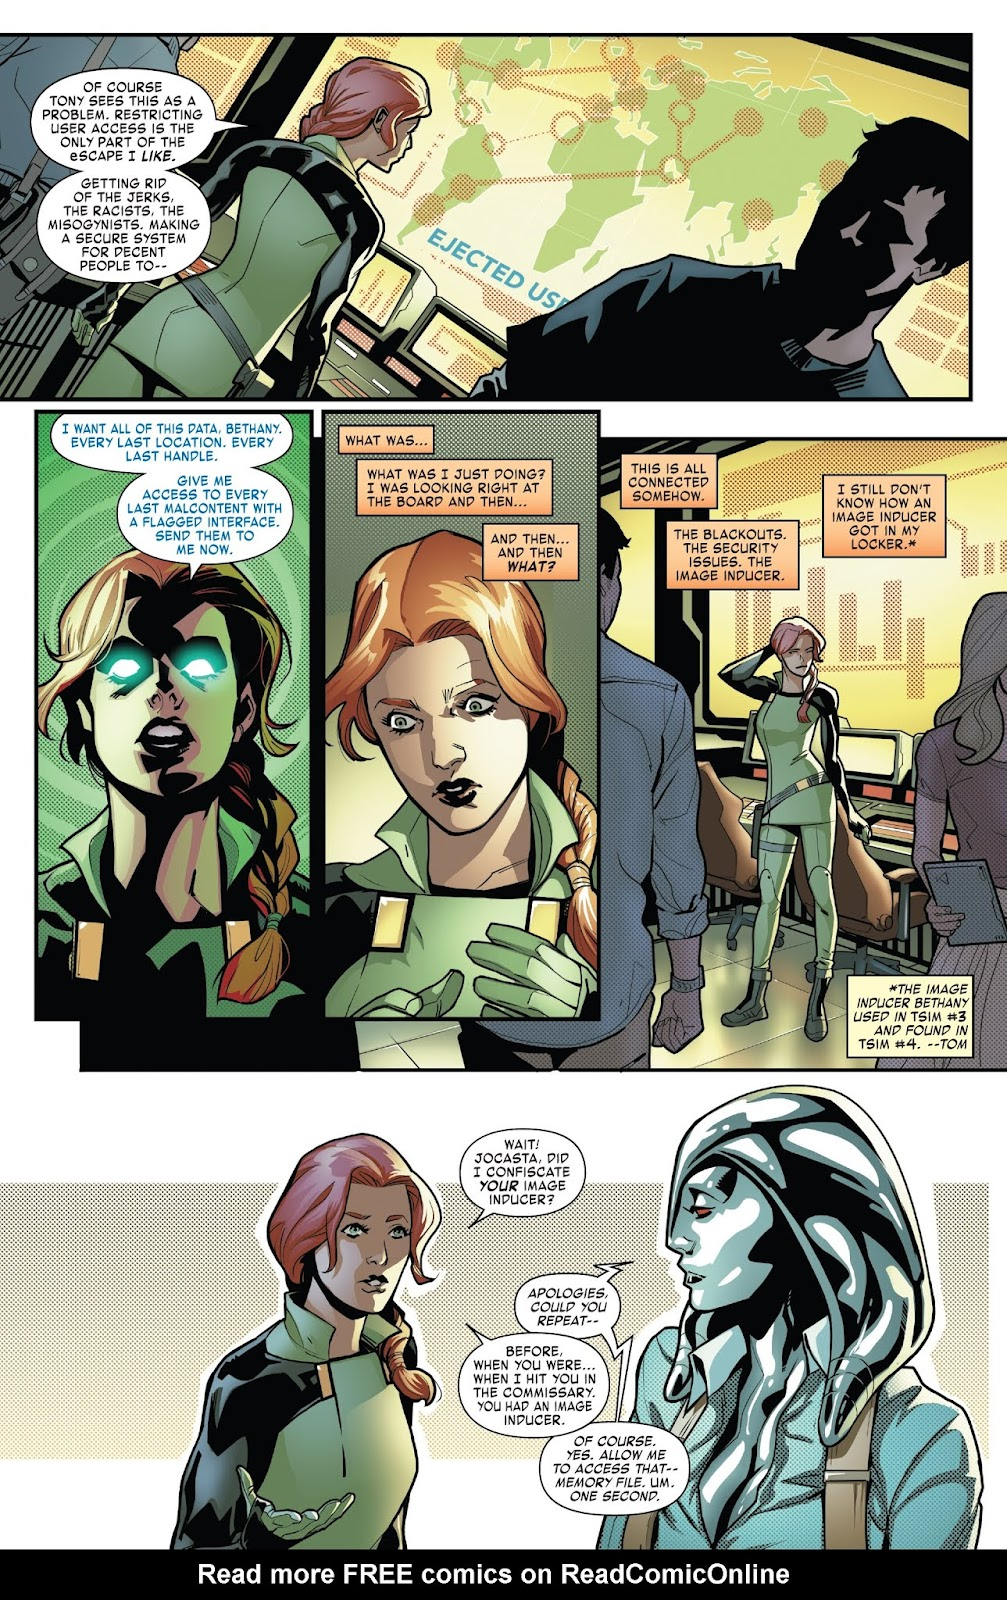 Read online Tony Stark: Iron Man comic -  Issue #6 - 14